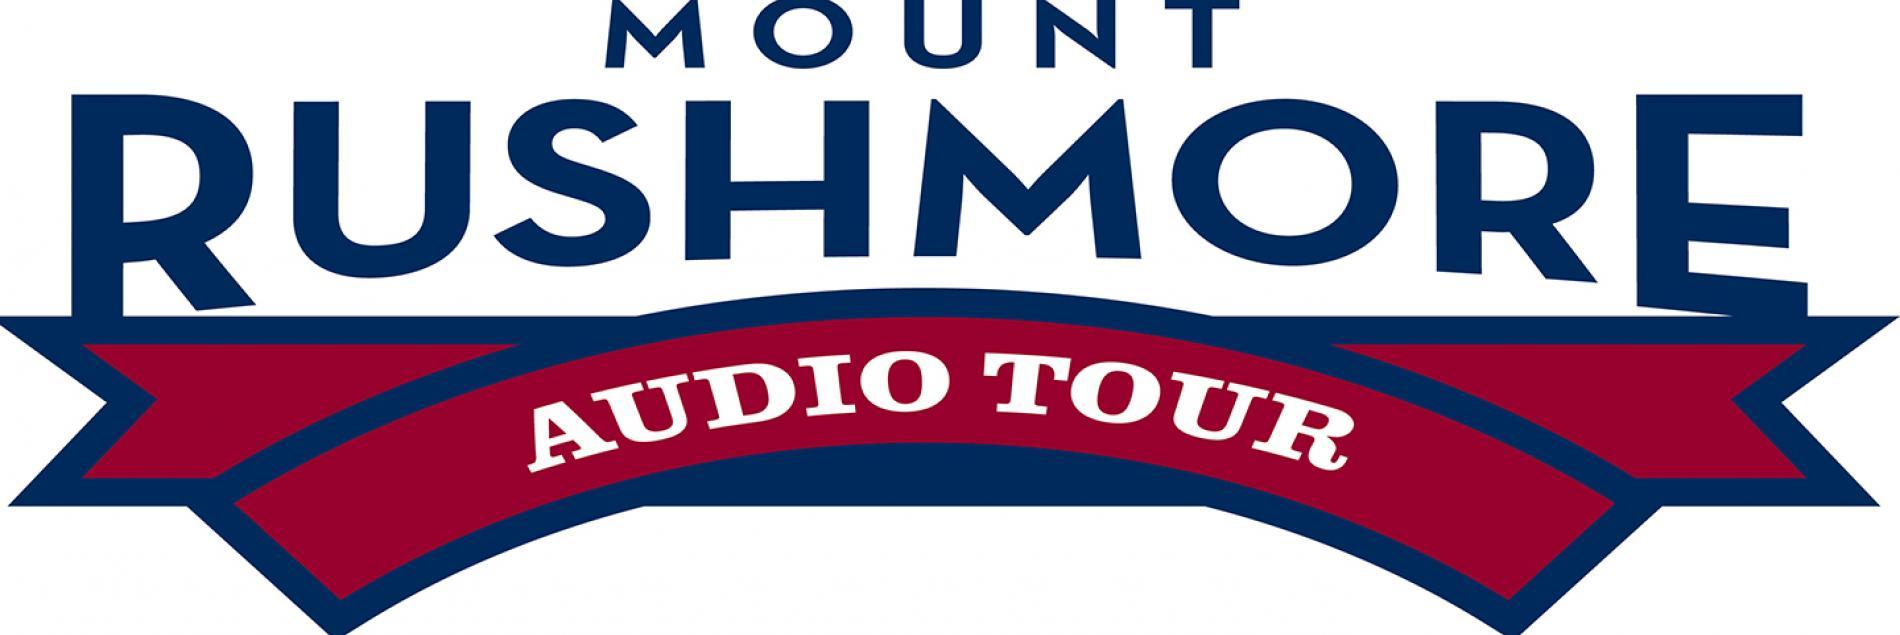 Mount Rushmore Audio Tour & Bookstores